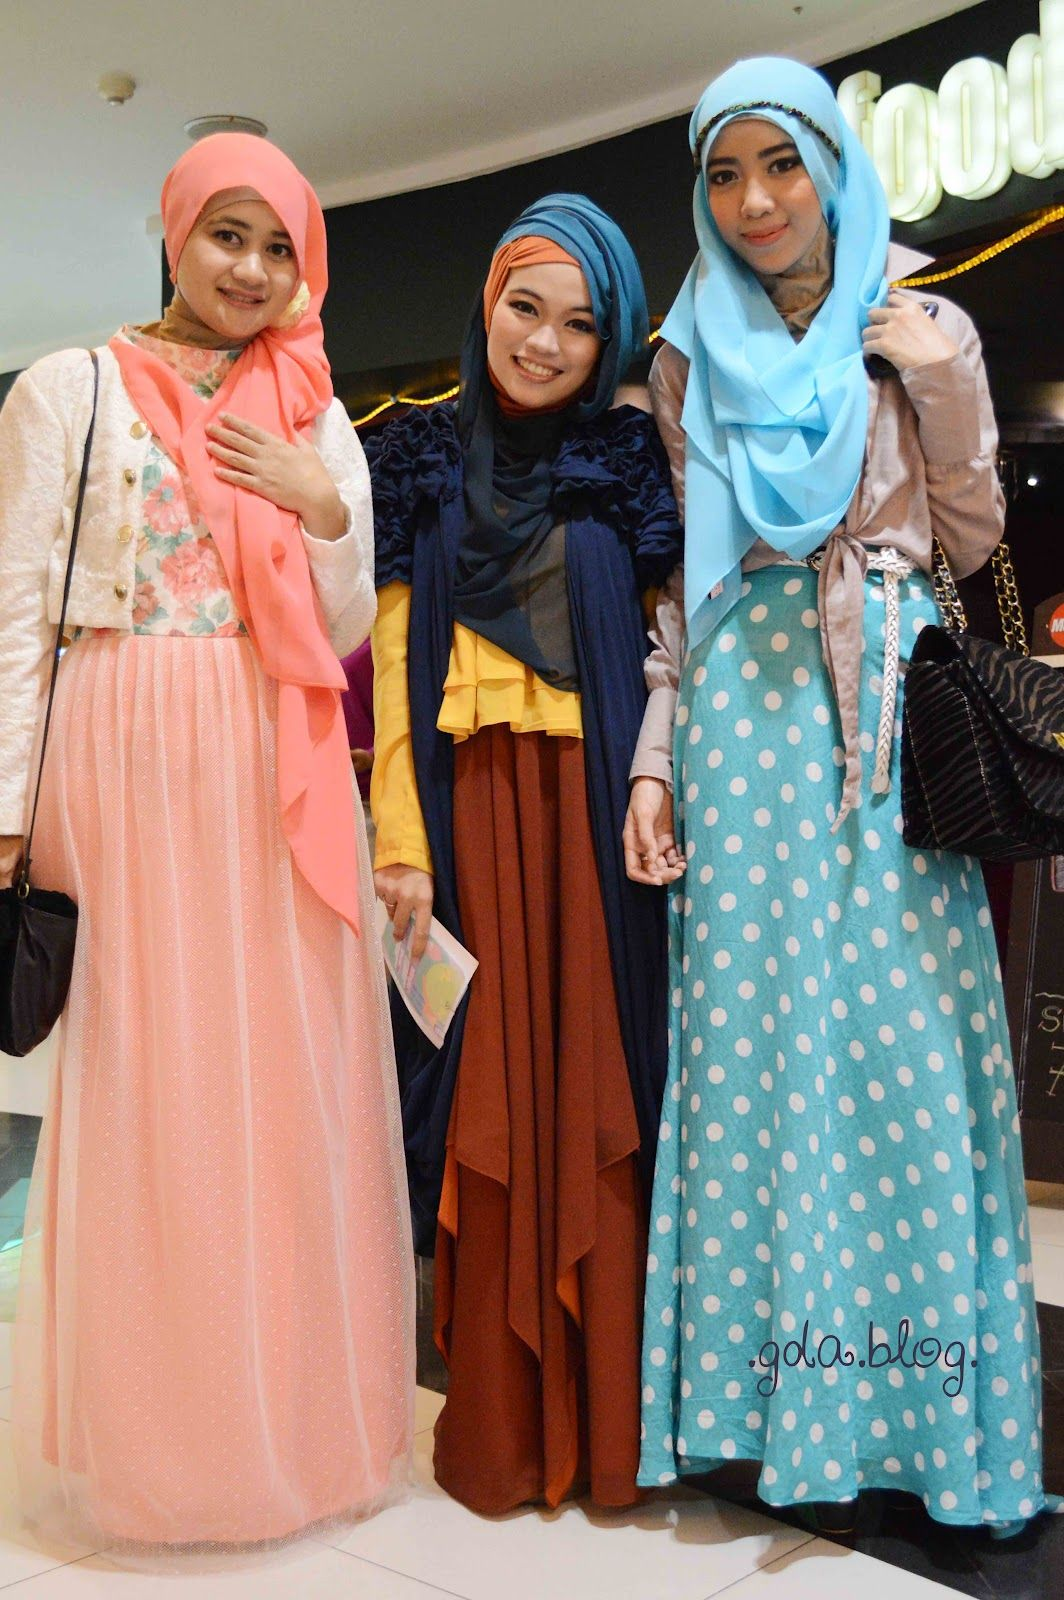 to wear - Muslimah stylish tumblr video